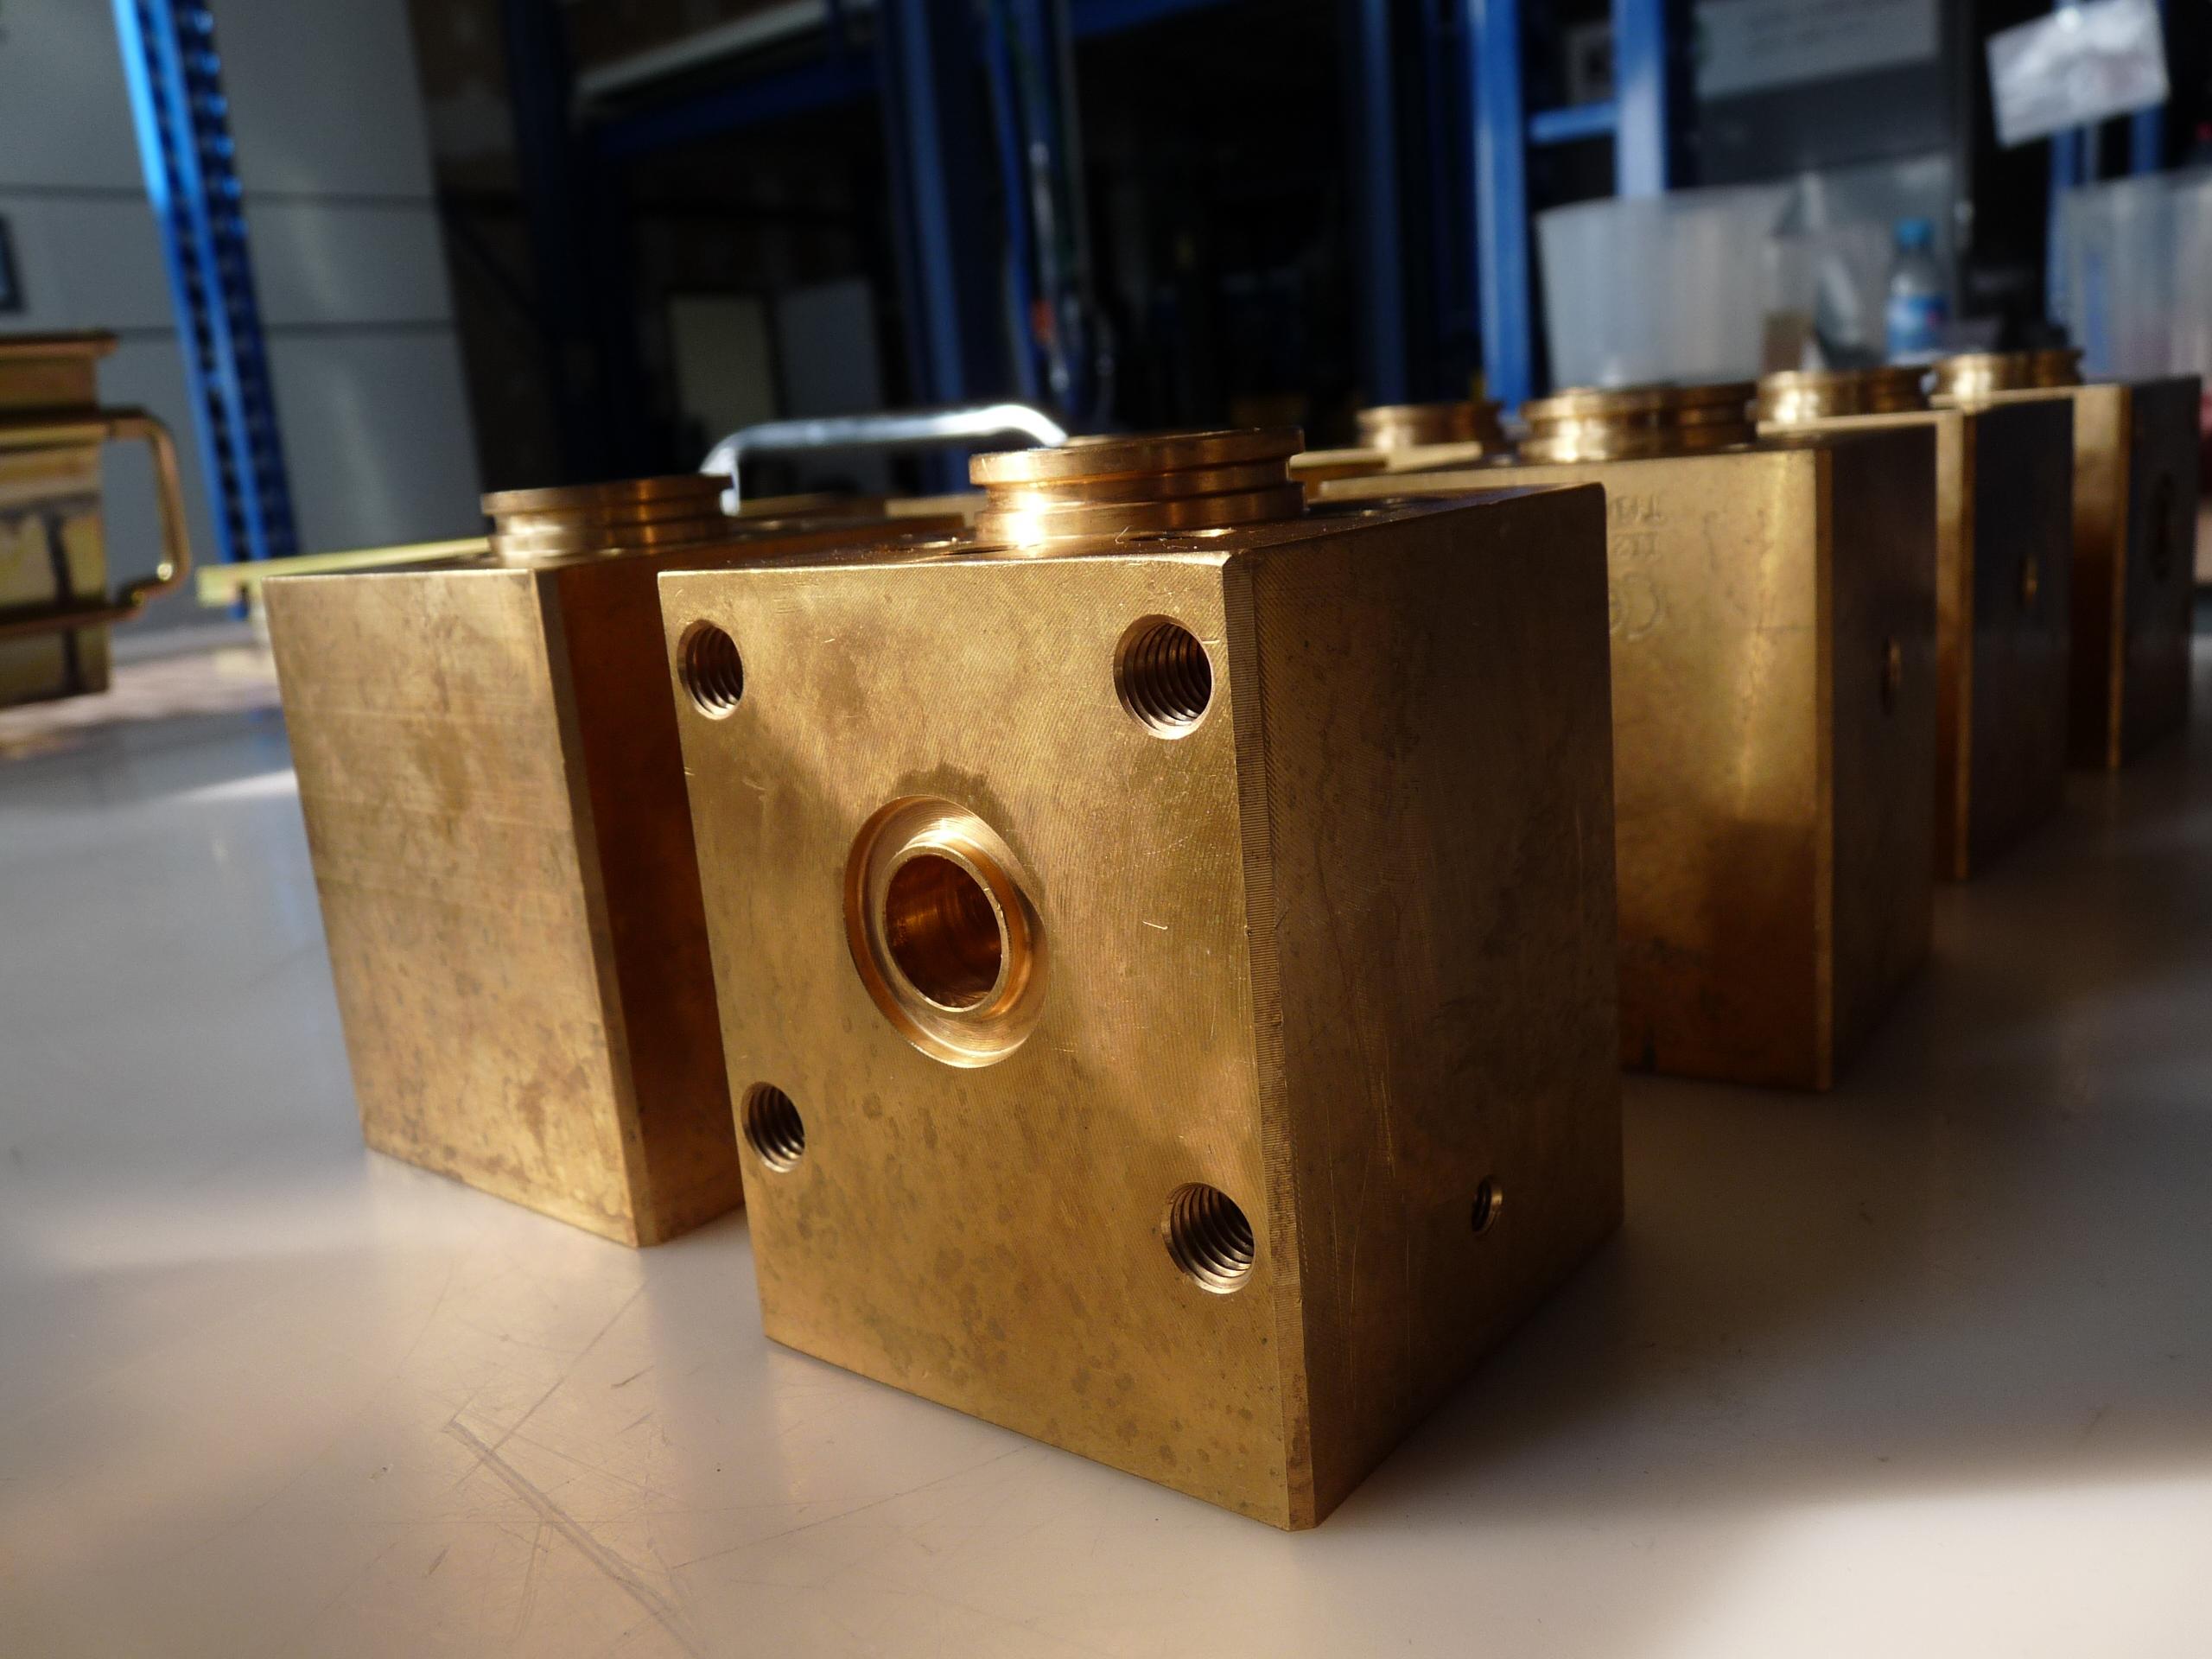 Pieza mecánica compleja - Dense Fluid Degreasing